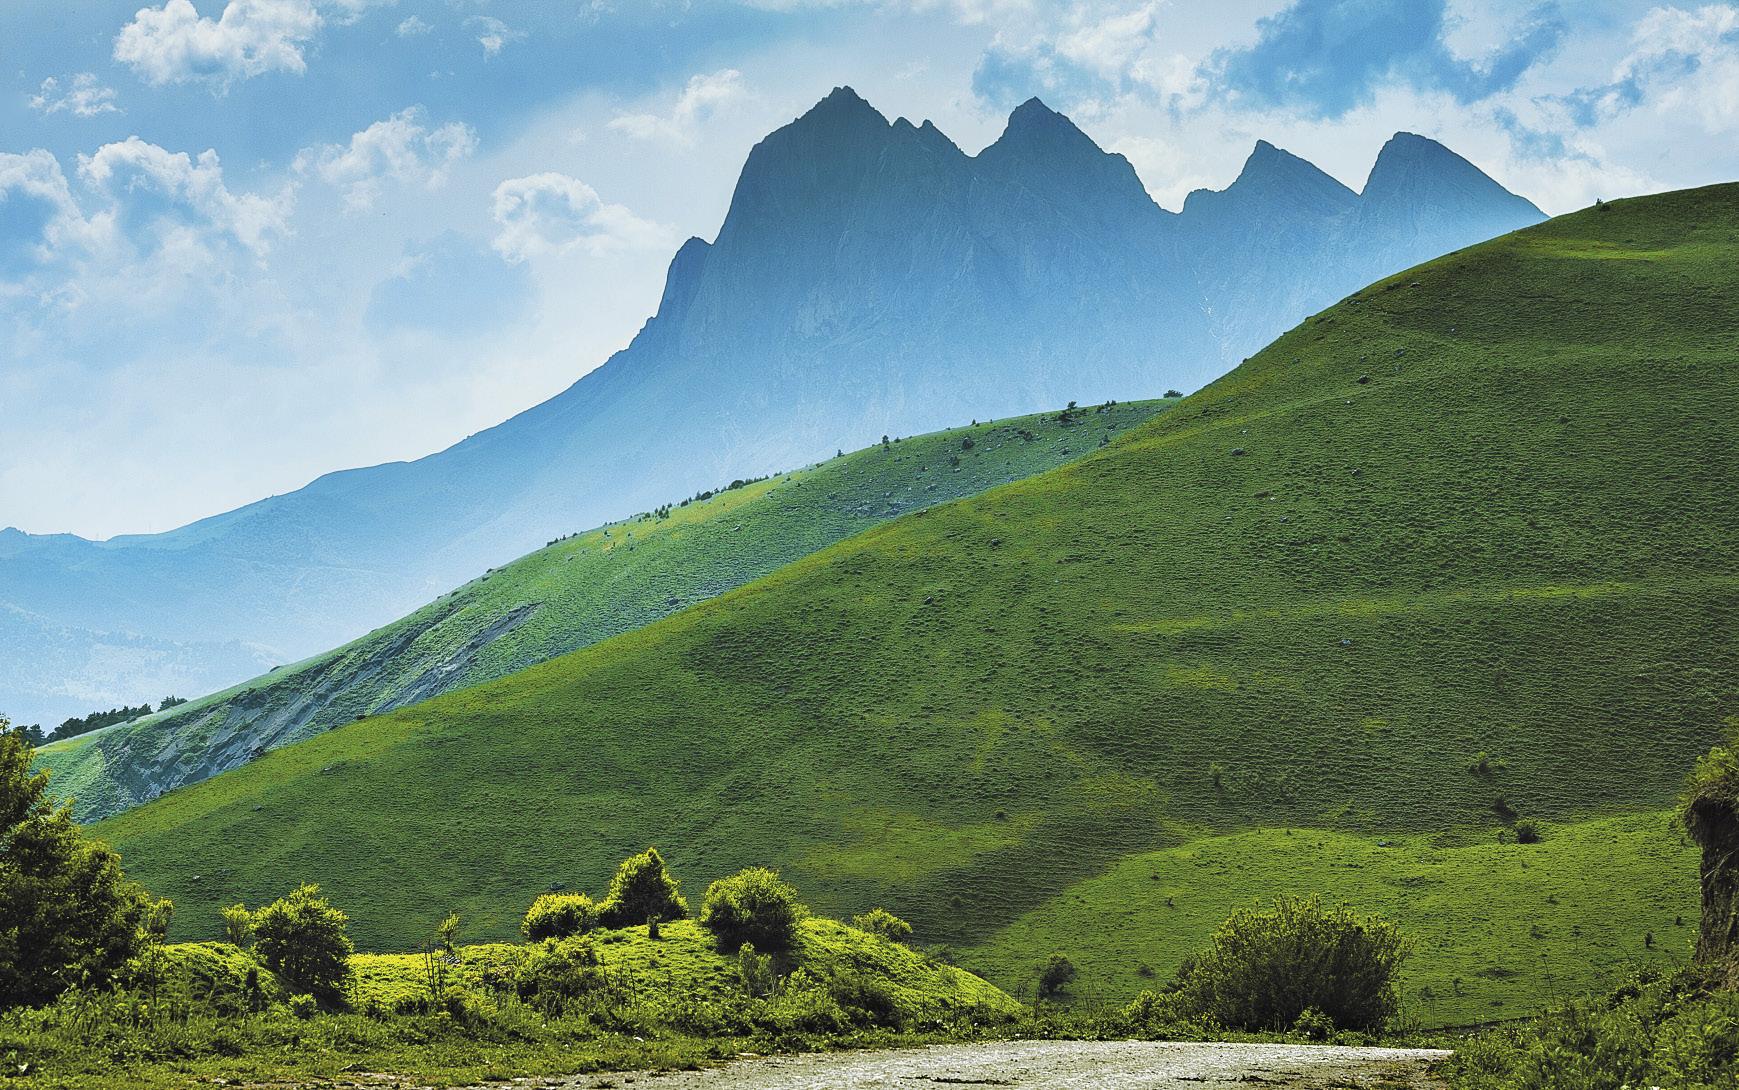 От панорамы горной гряды Цей-Лоам захватывает дух.